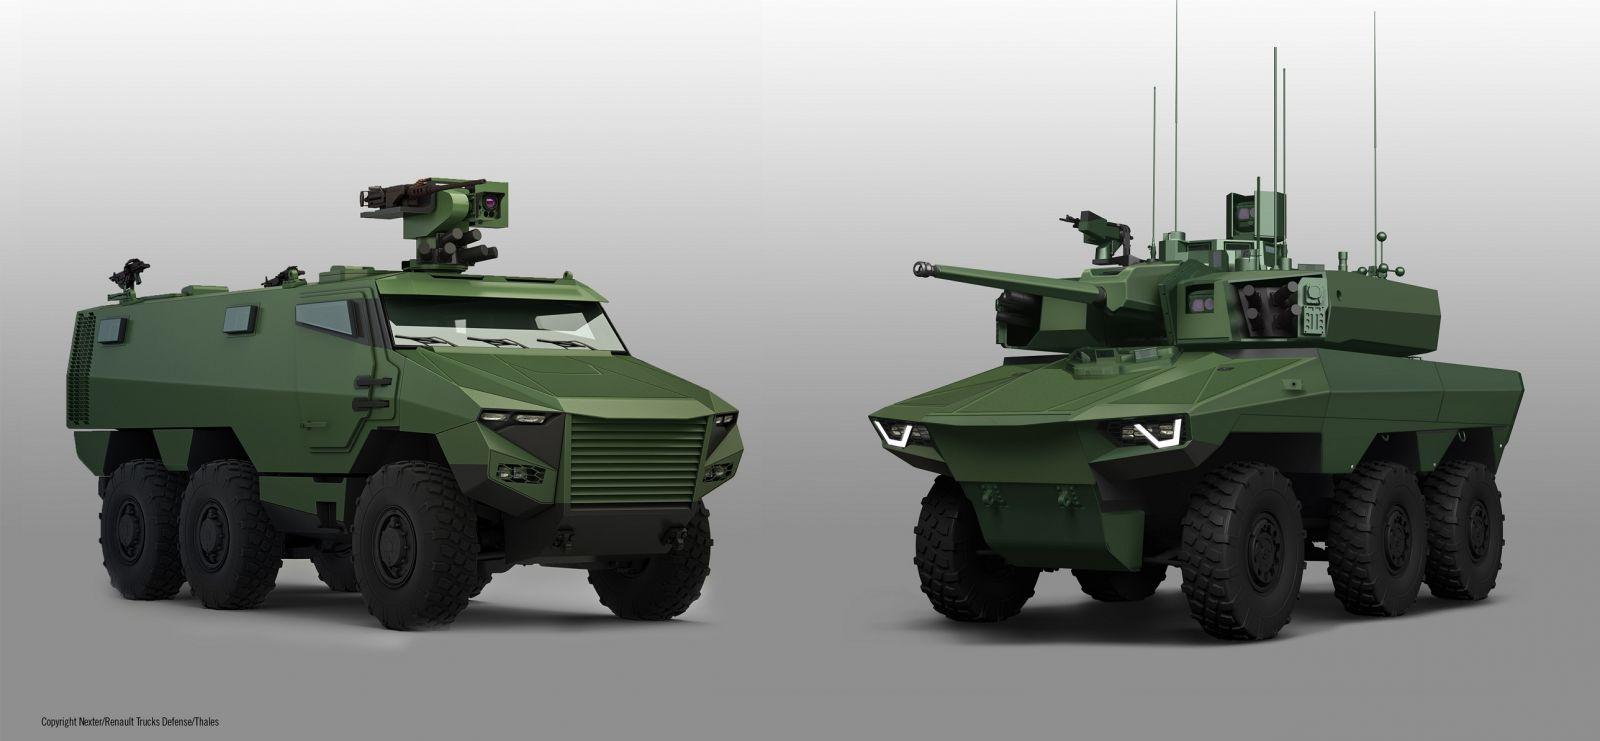 141209-scorpion-blindado-francia-griffon-jaguar-nexter-1